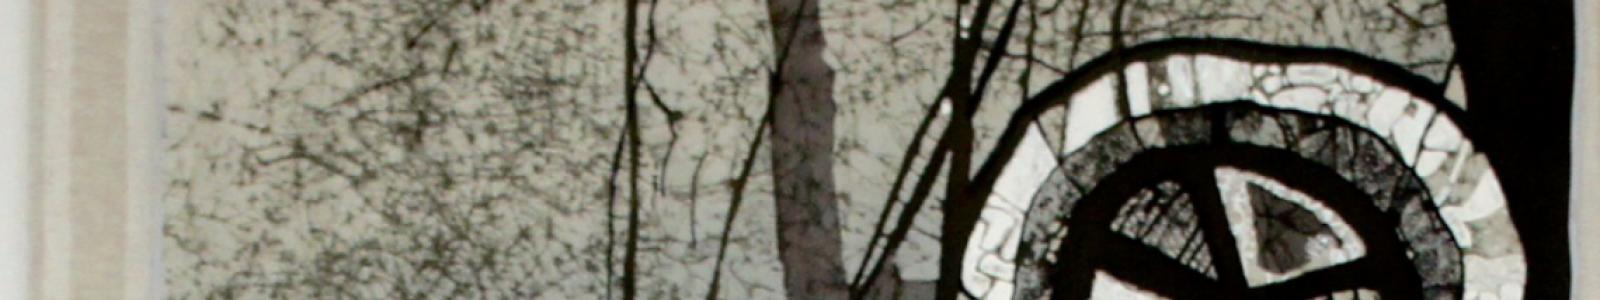 Gallery Painter ALEKSANDR LIKHACHEV